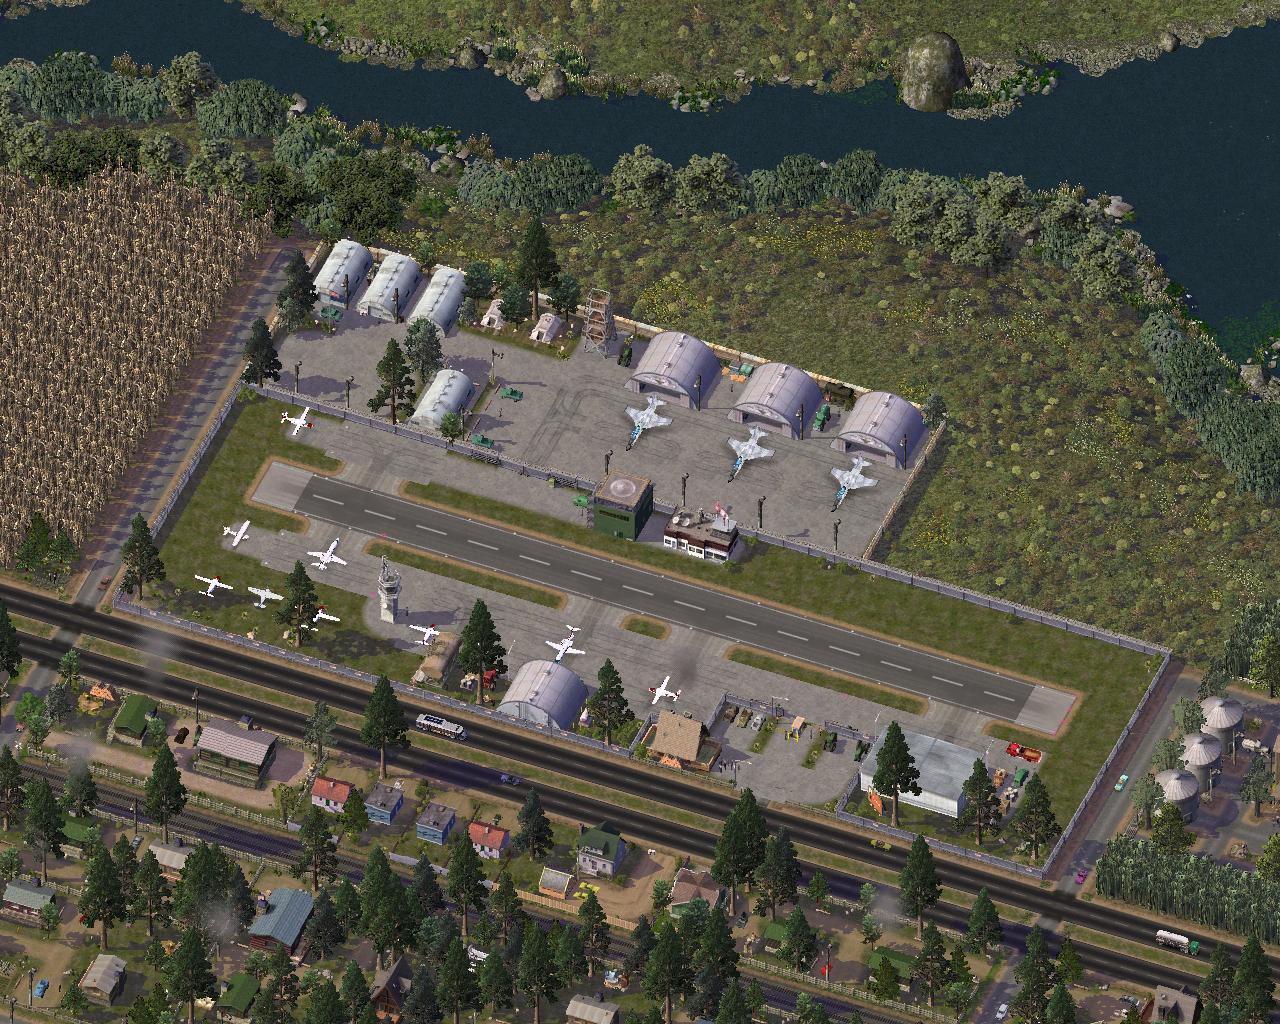 passenger station | Screwpile Developments